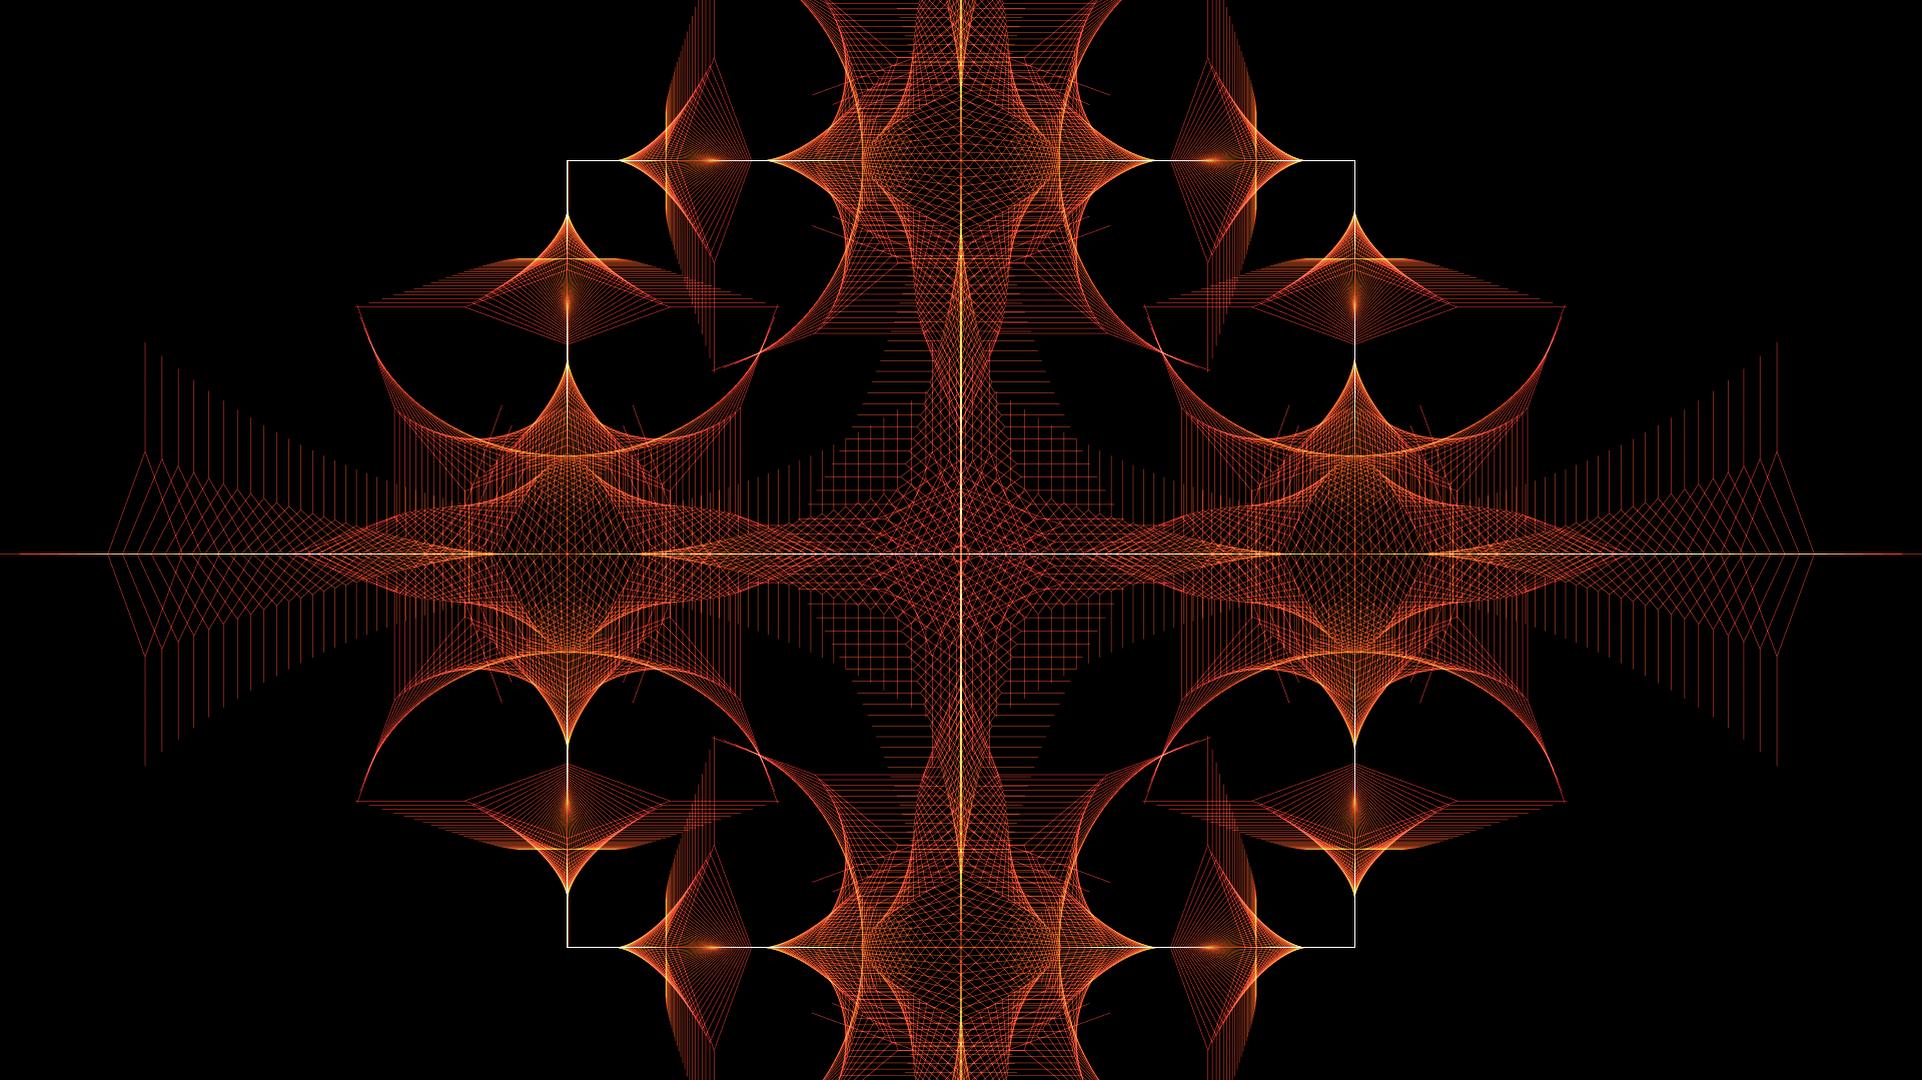 Artistic Orange Color Digital Art Pattern 1922x1080